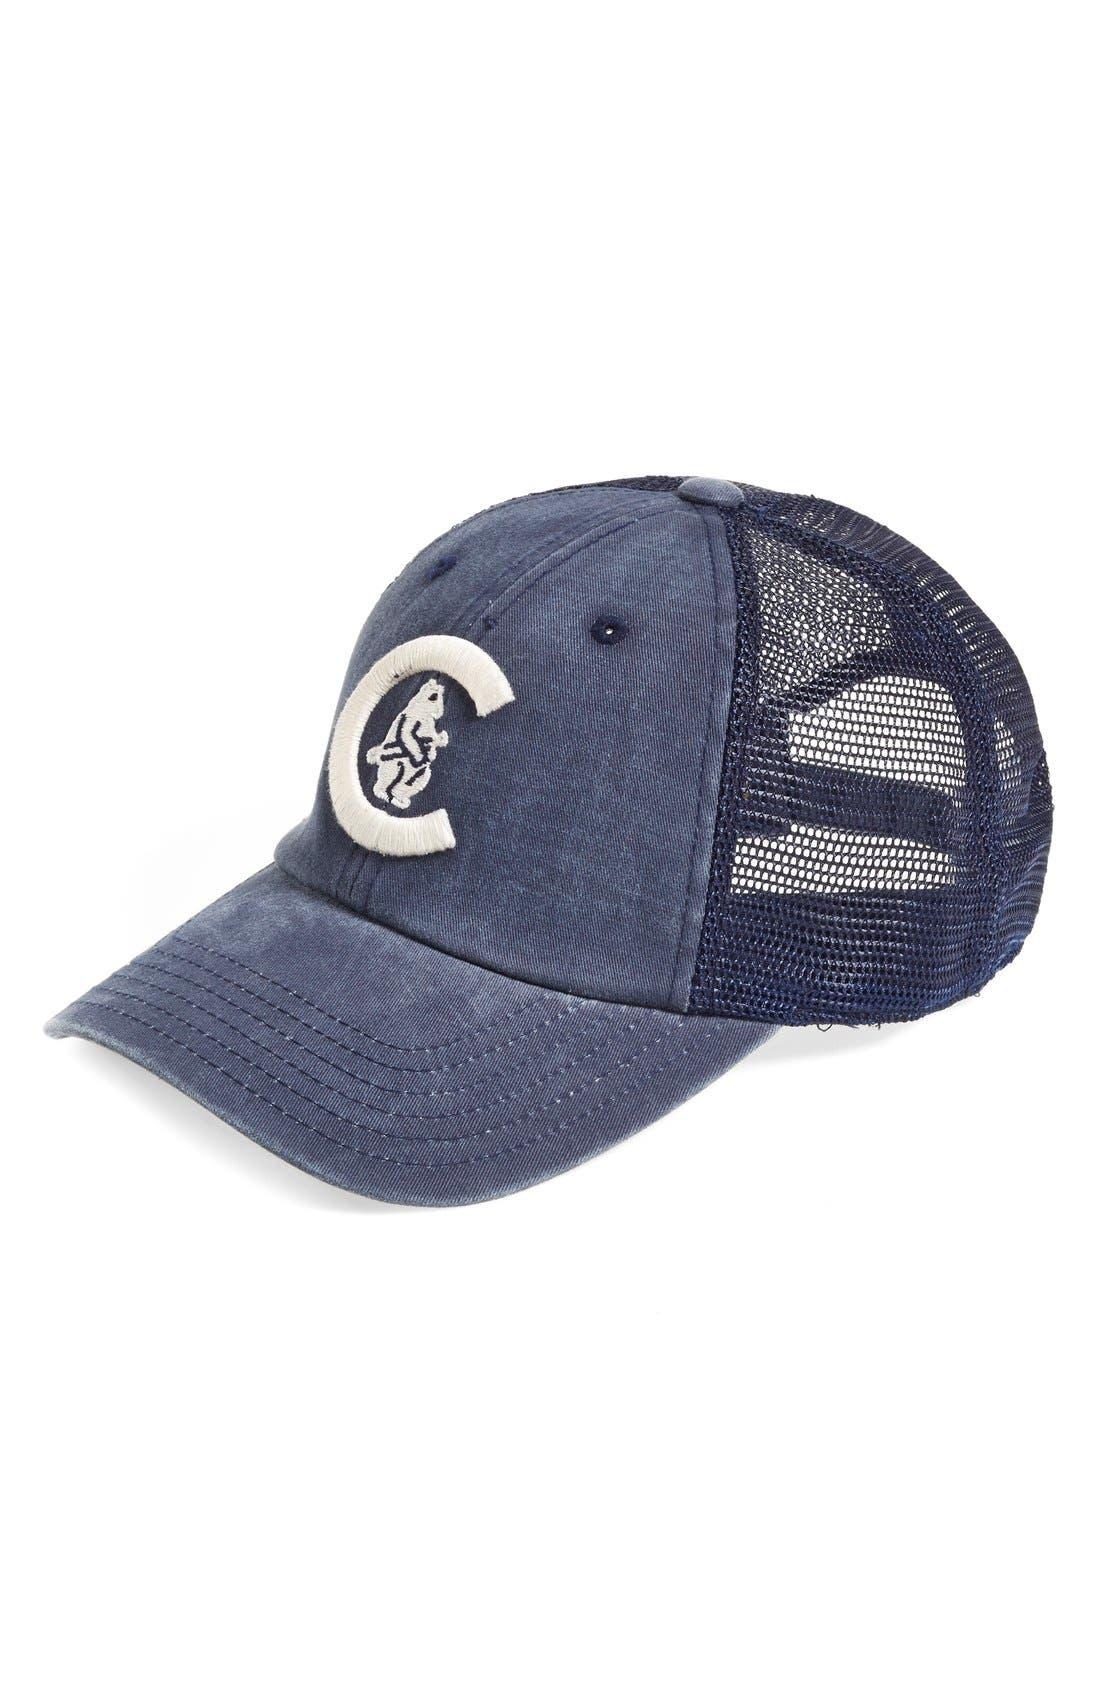 'Chicago Cubs - Raglan Bones' Mesh Trucker Cap,                             Main thumbnail 1, color,                             Navy